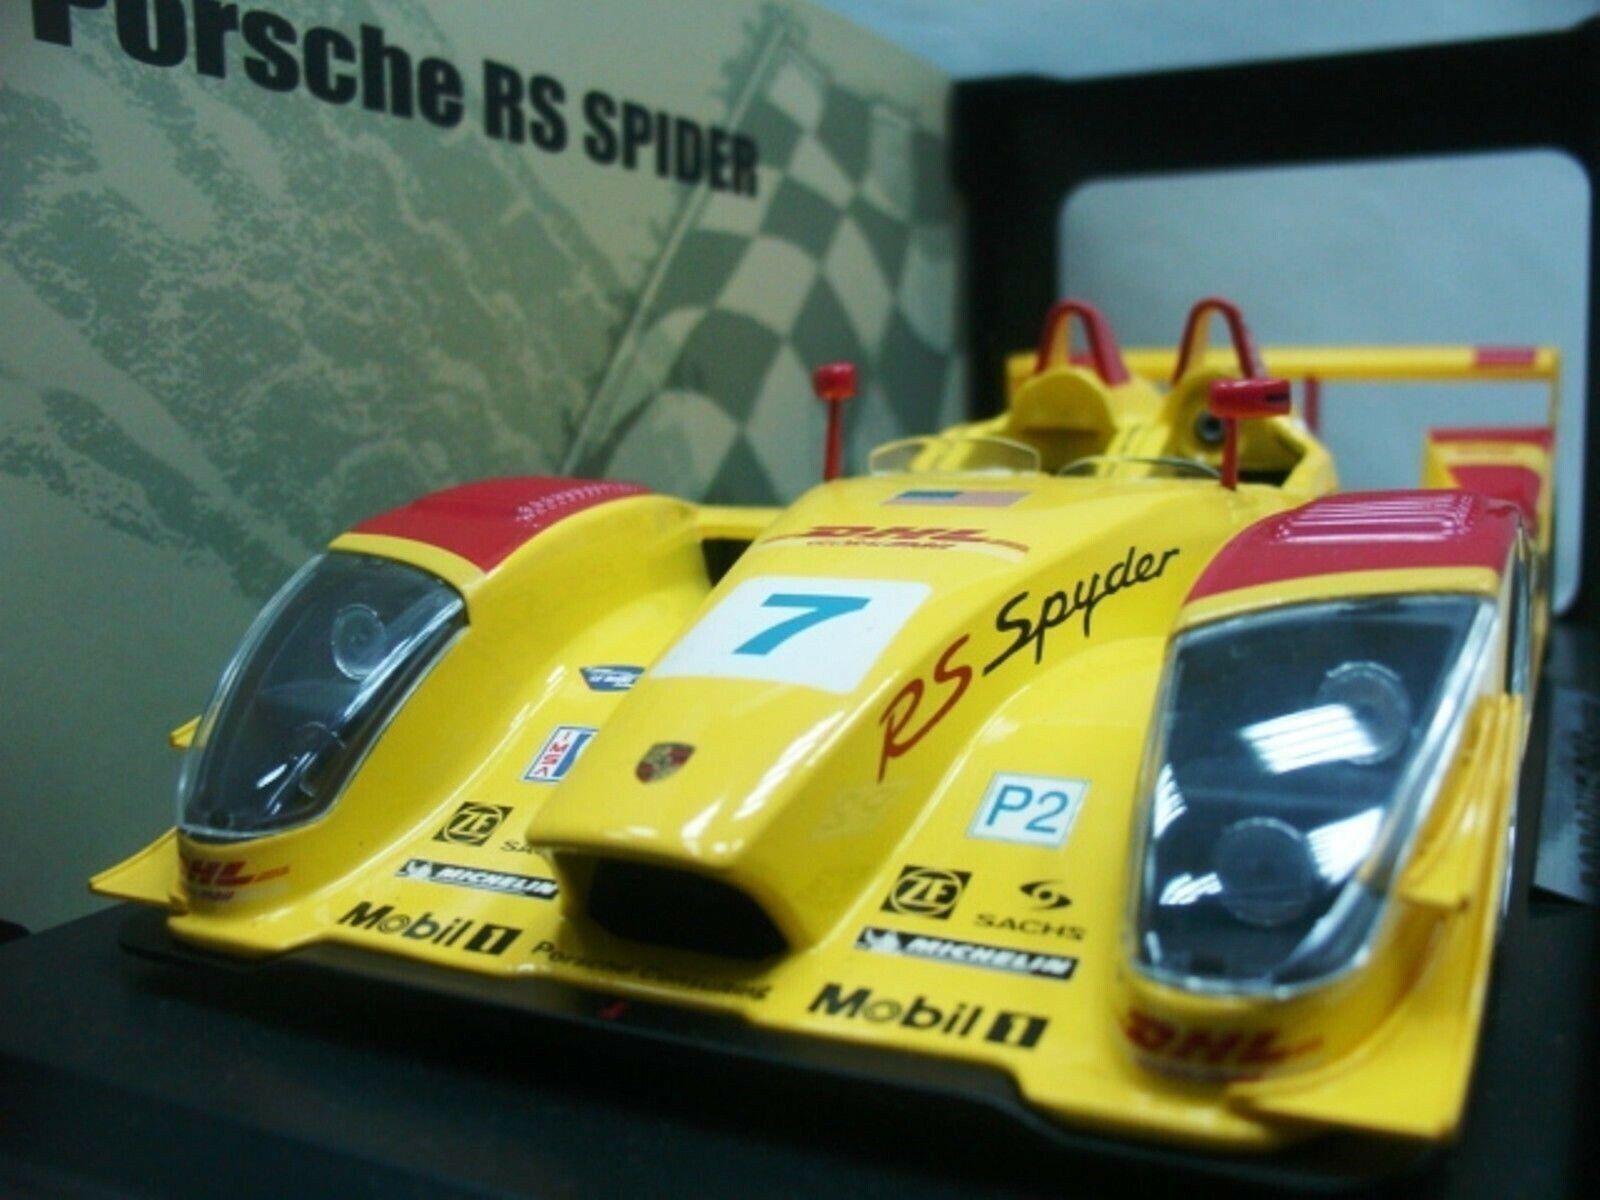 Wow extrêmement rare Porsche RS Spyder 2006  7 12hrs Sebring 1 18 Norev-SPARK 962